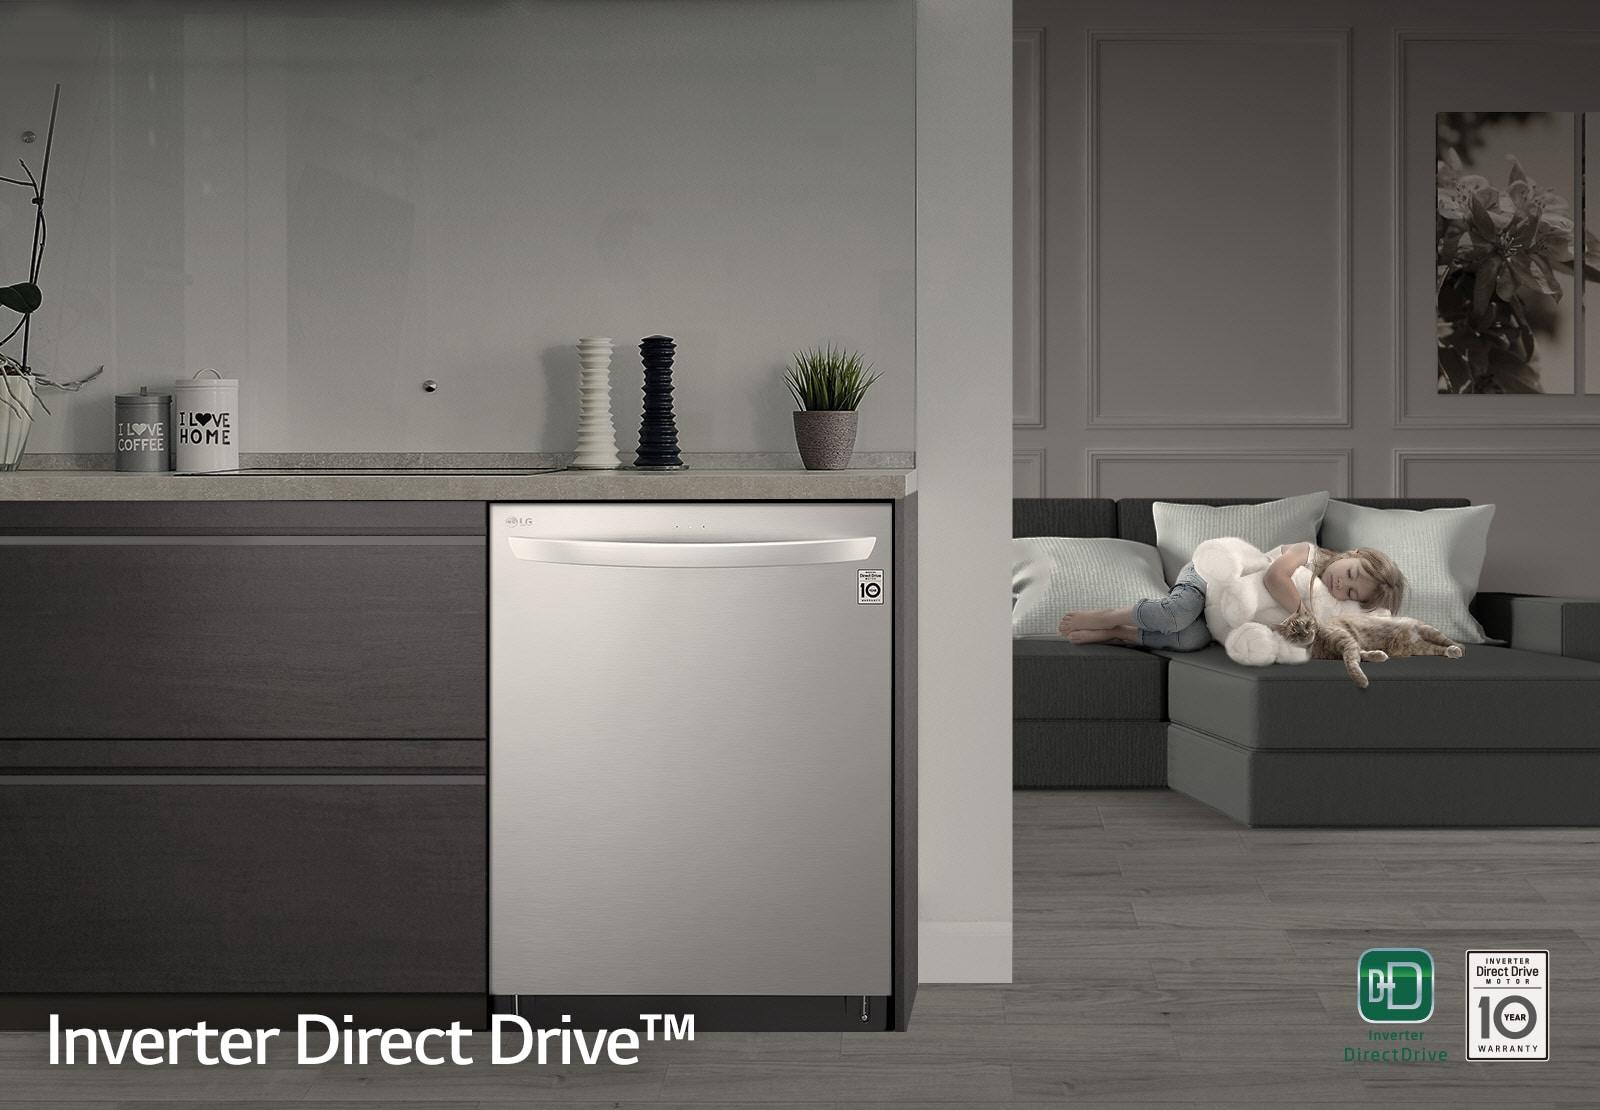 LG Inverter Drice Drive Dishwasher